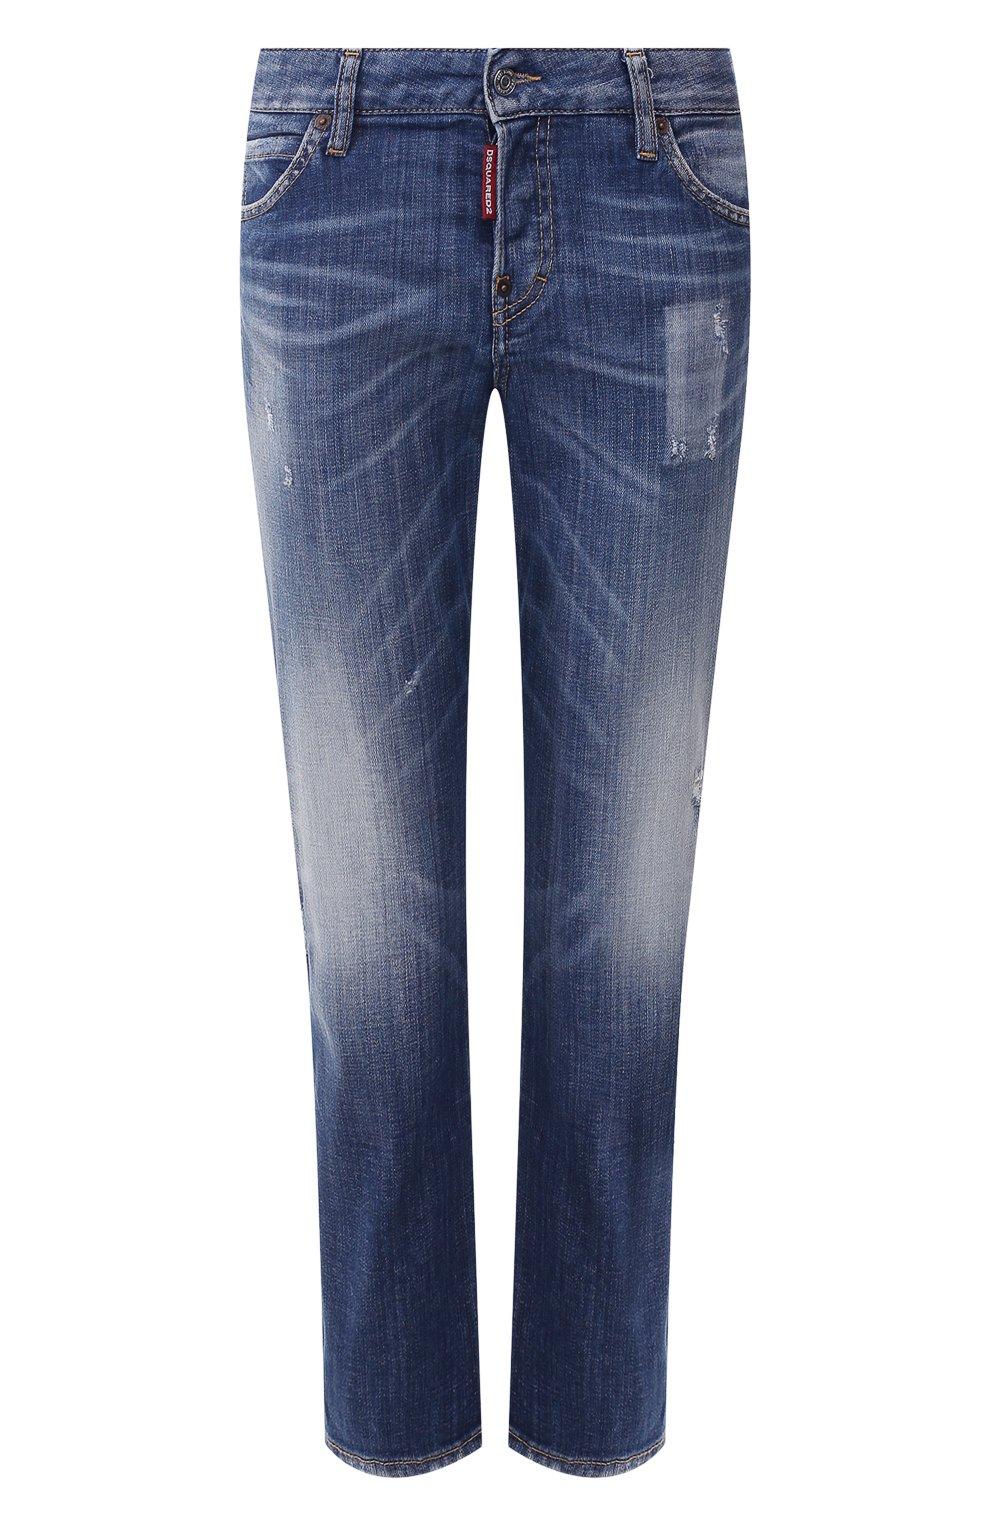 Женские джинсы DSQUARED2 синего цвета, арт. S75LB0322/S30342   Фото 1